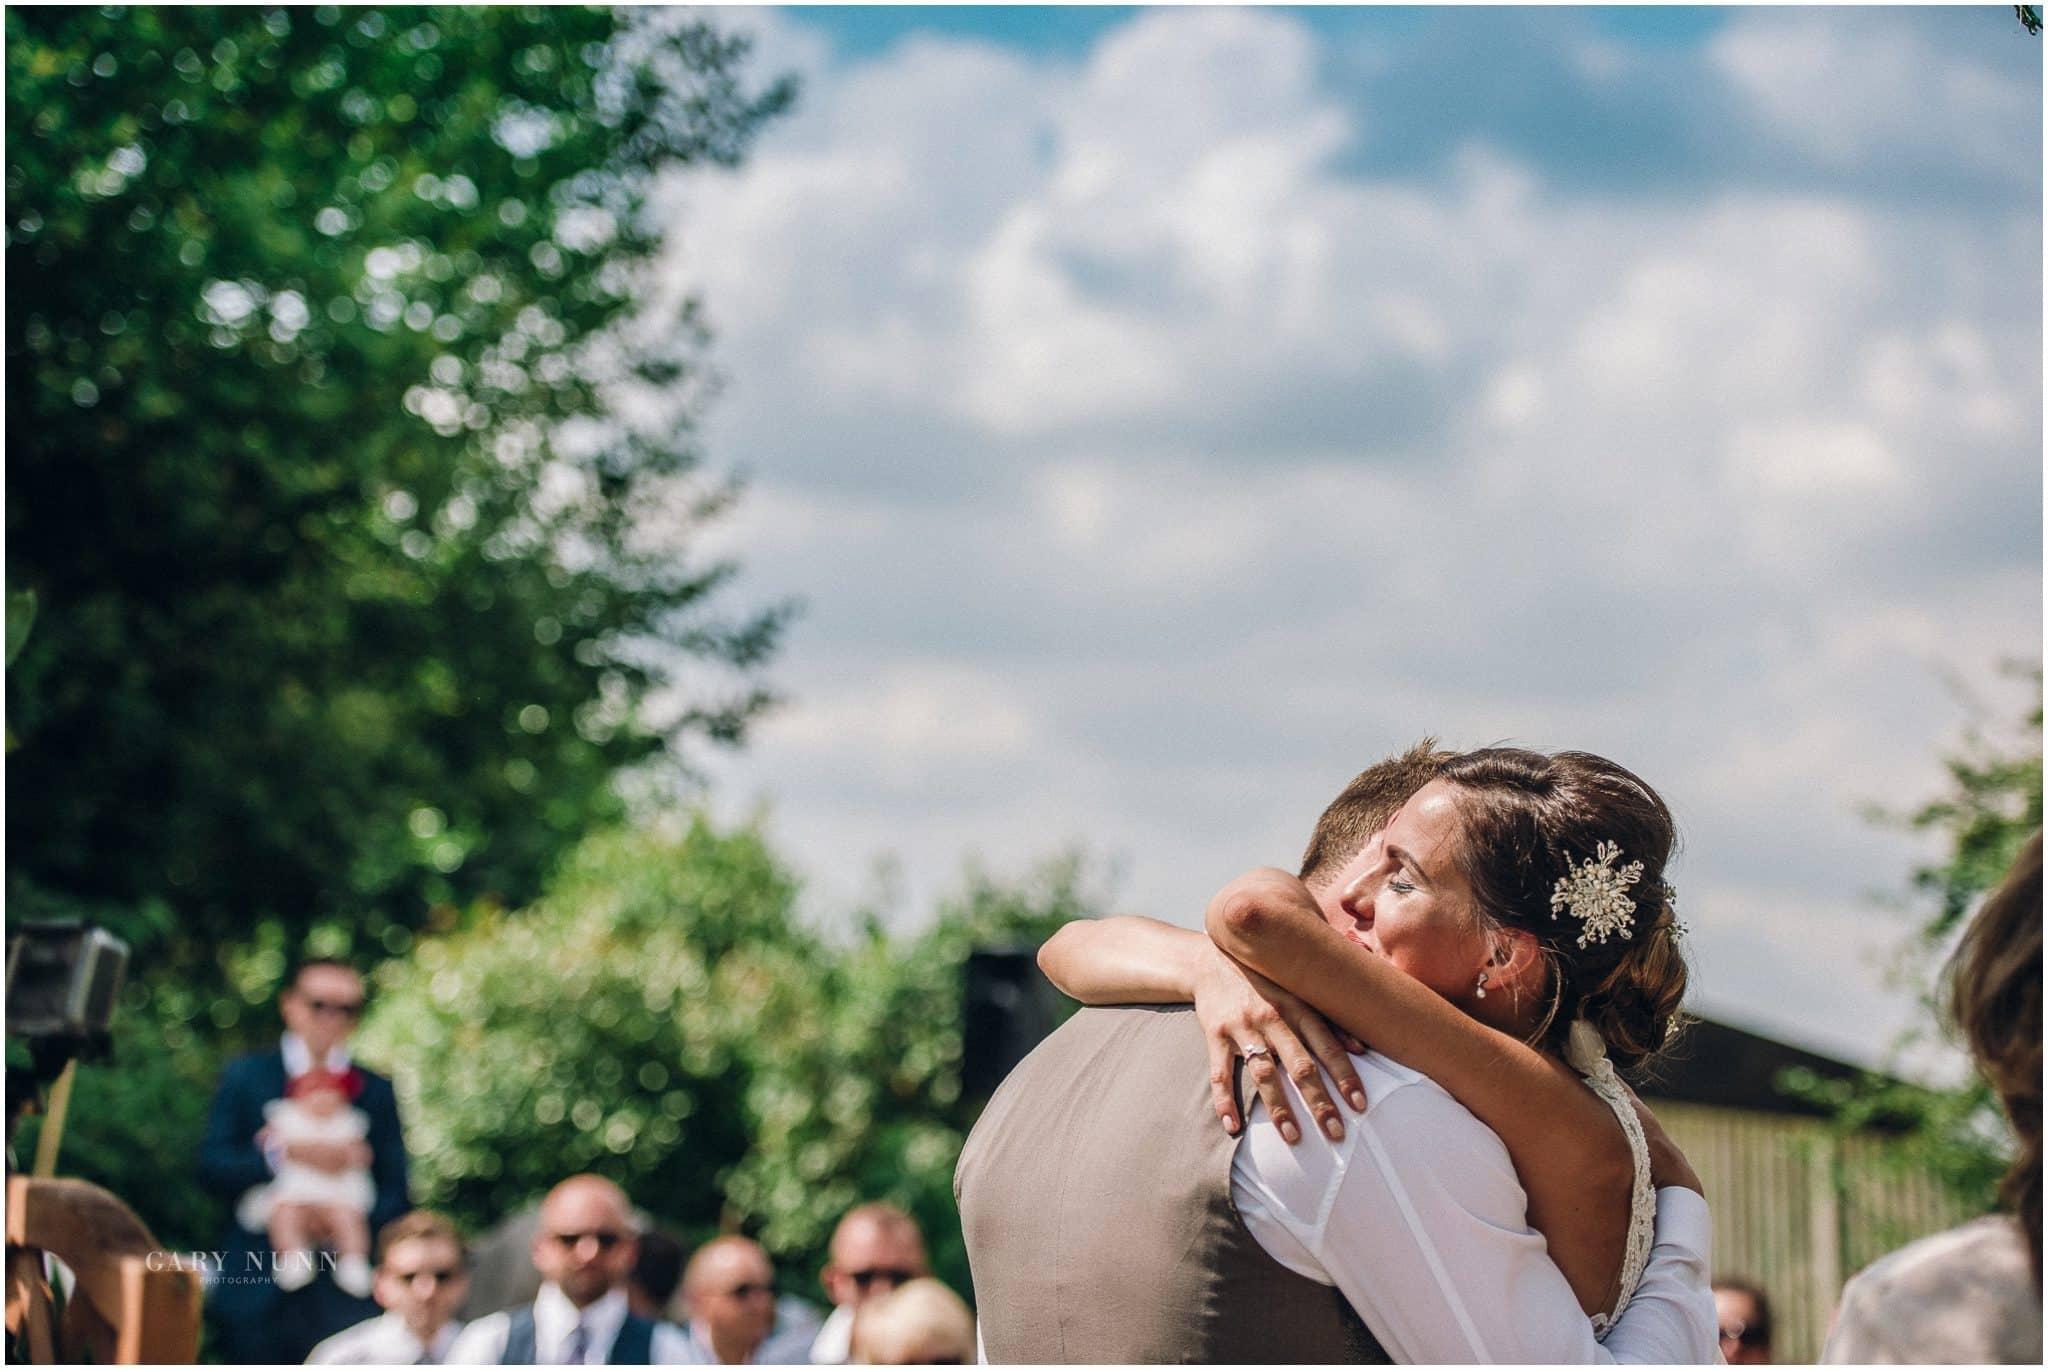 wedding photo checklist, first kiss